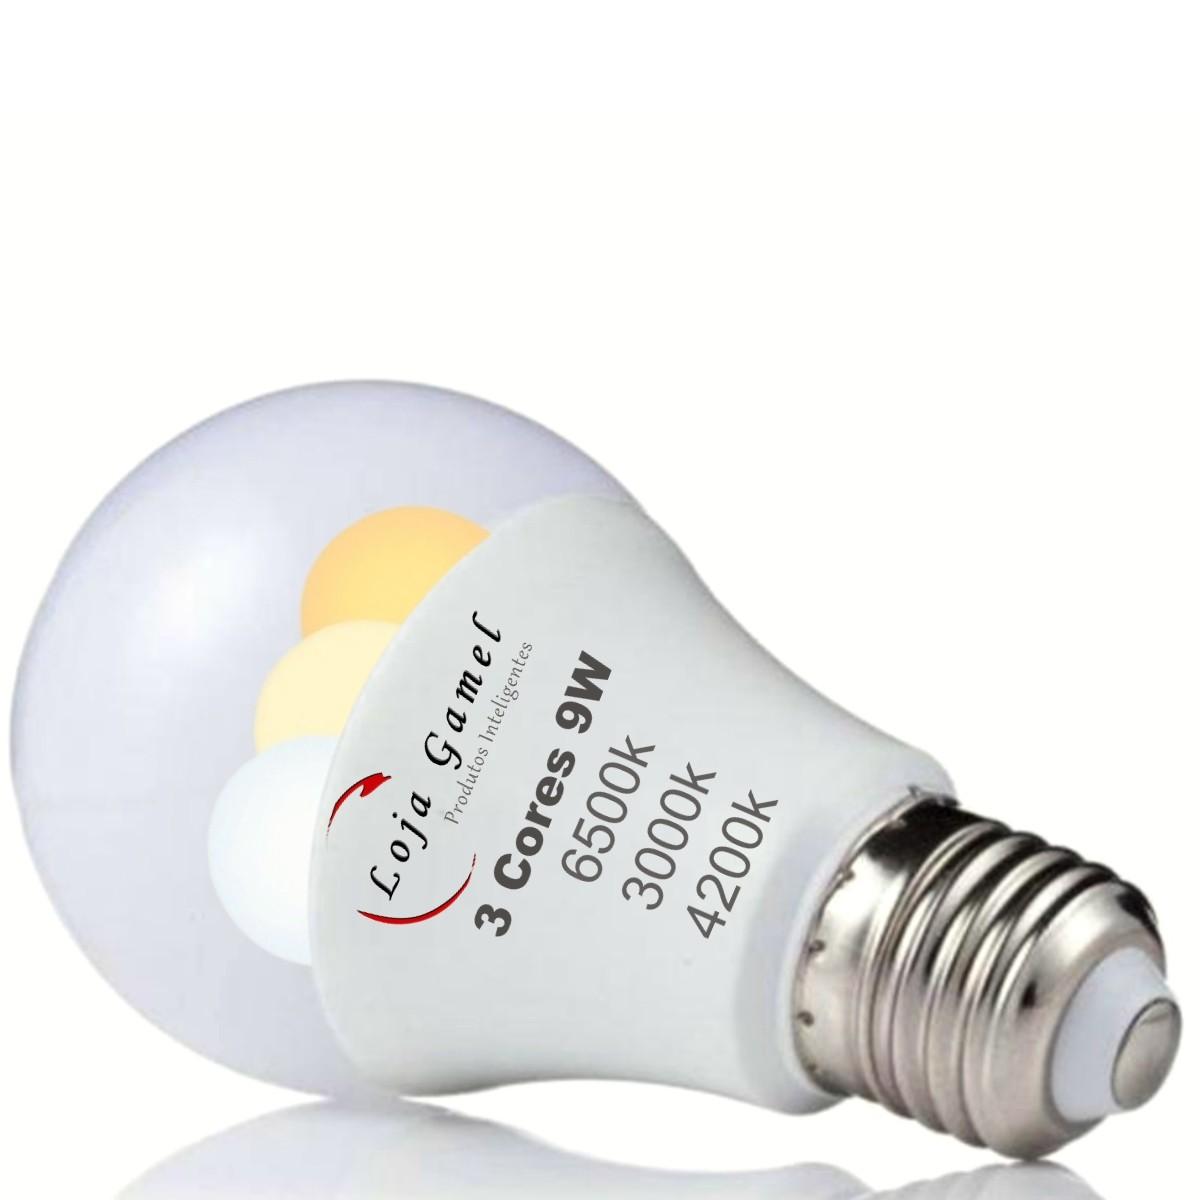 Foto 1 - Lâmpada Led Inteligente Bulbo 3 cores